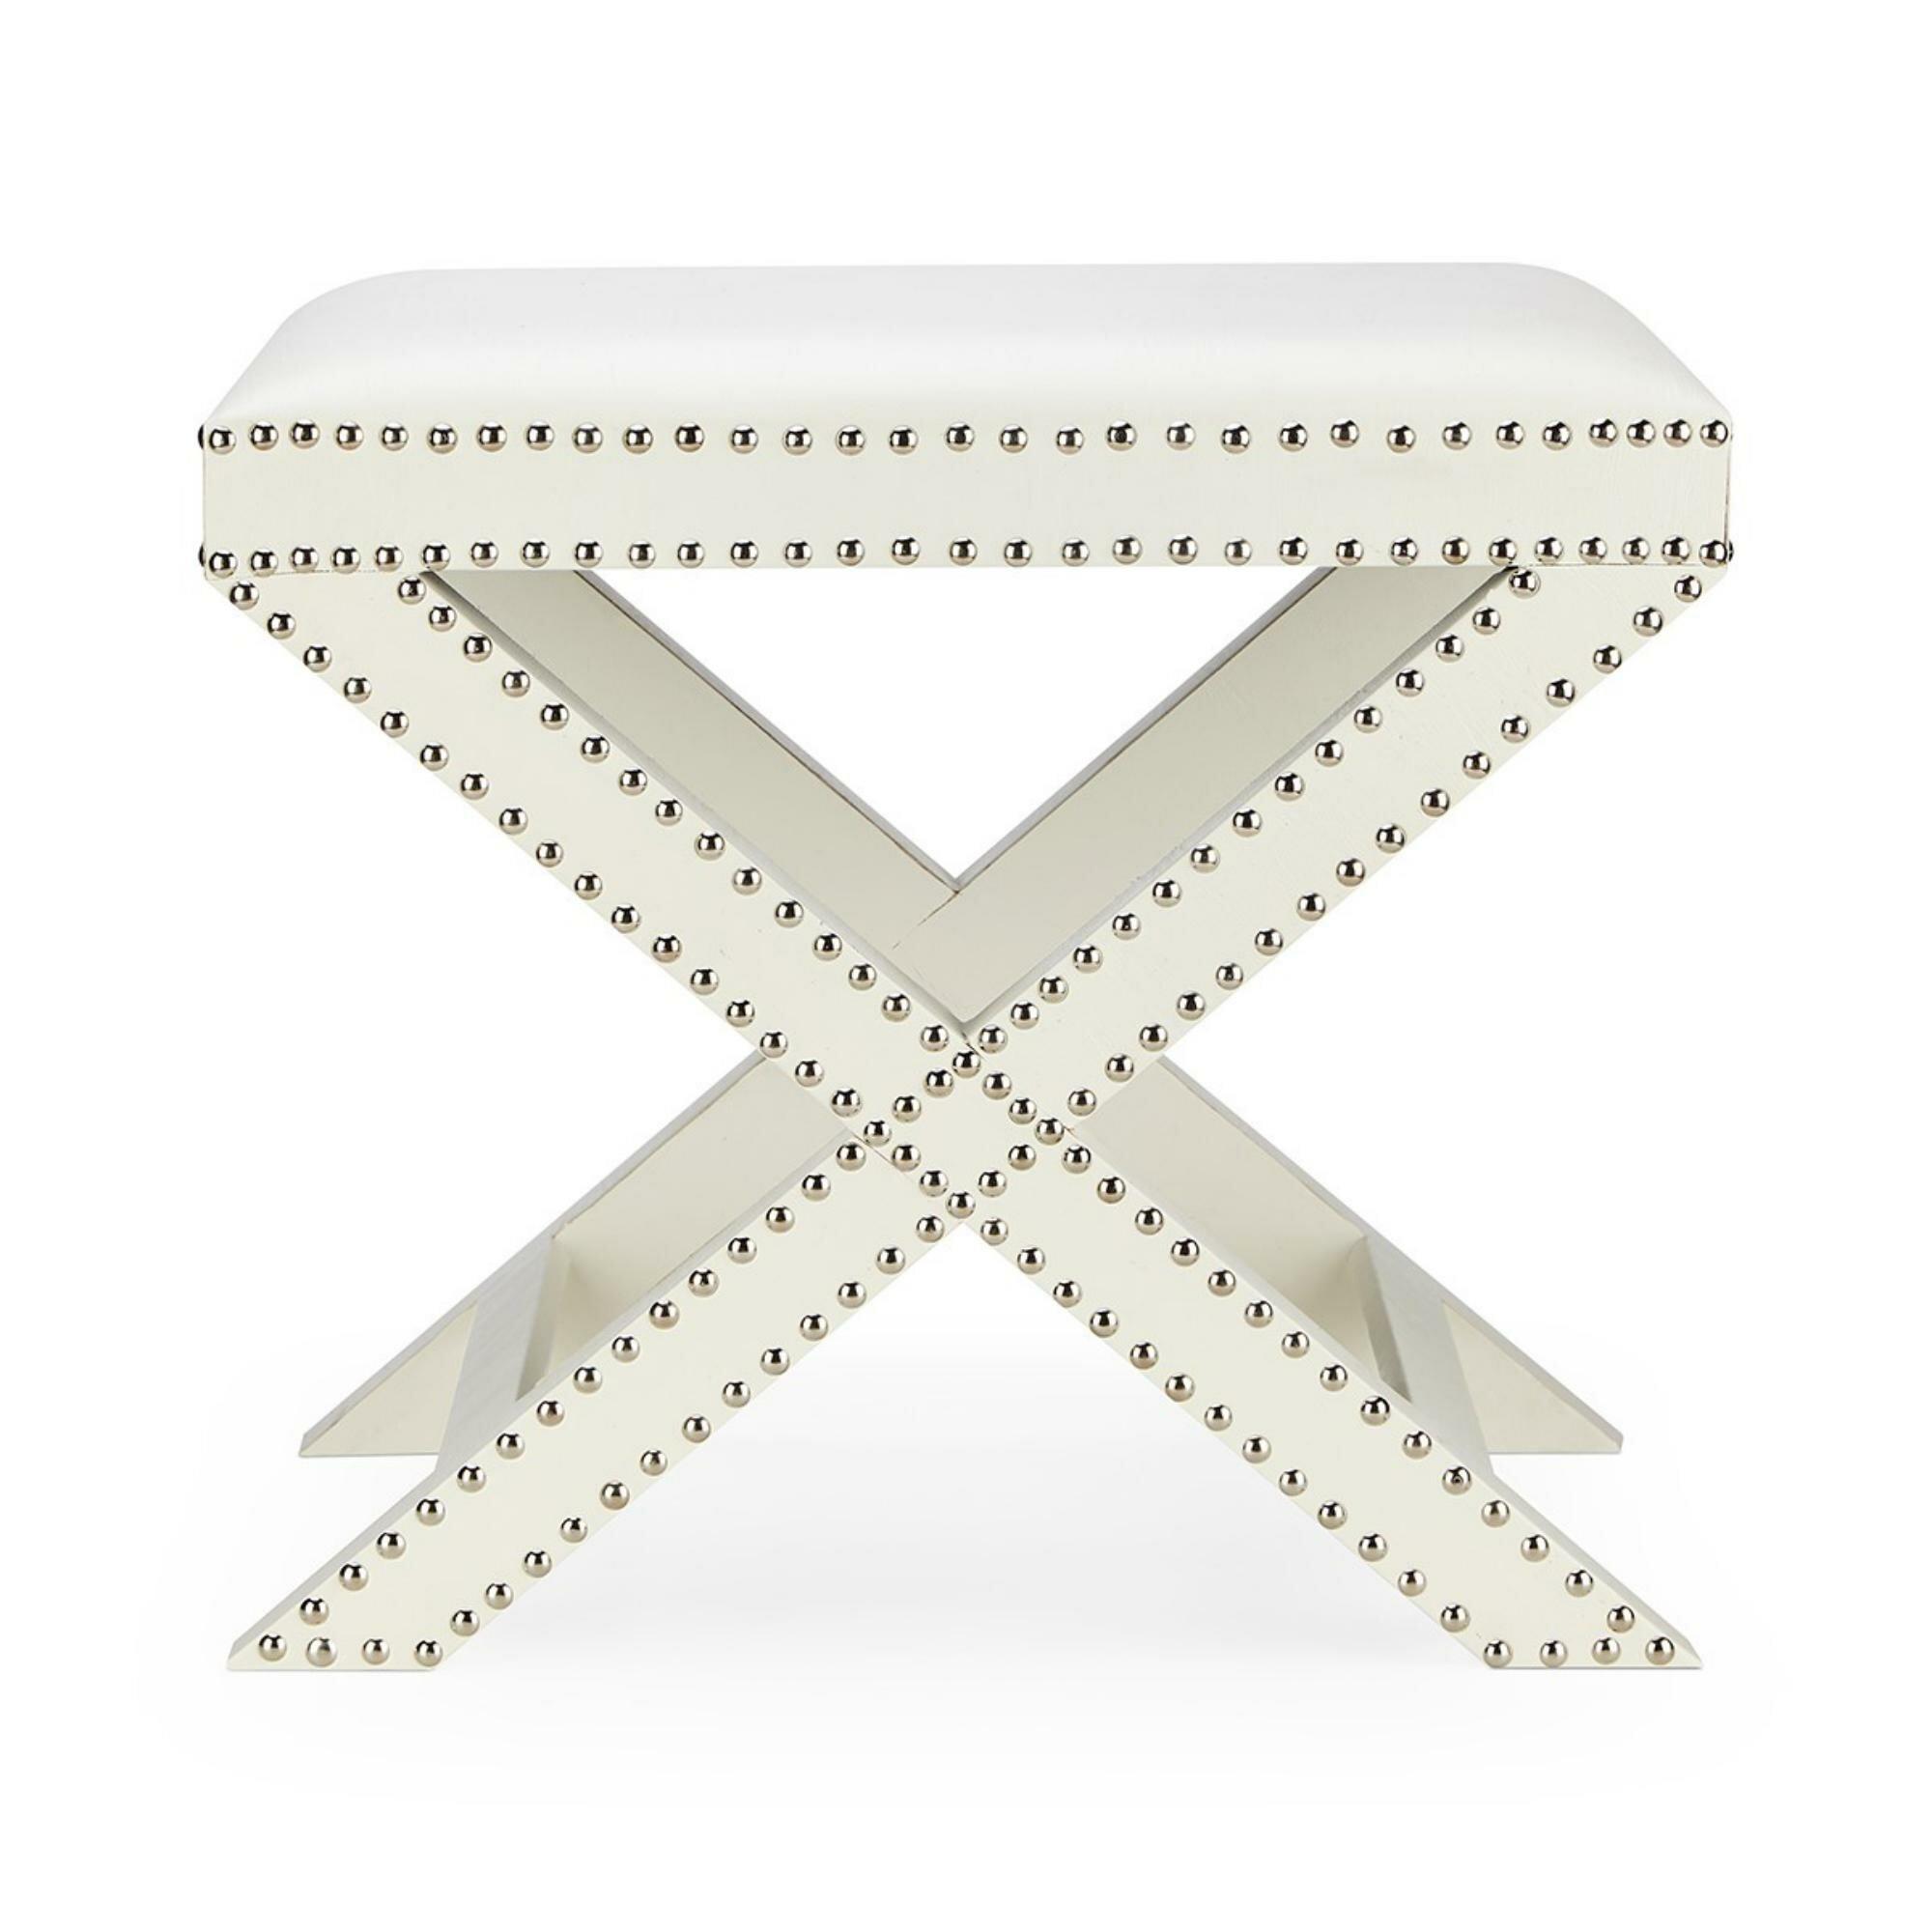 Surprising Details About Mercer41 Win Nailhead Trim Wooden Vanity Stool Short Links Chair Design For Home Short Linksinfo